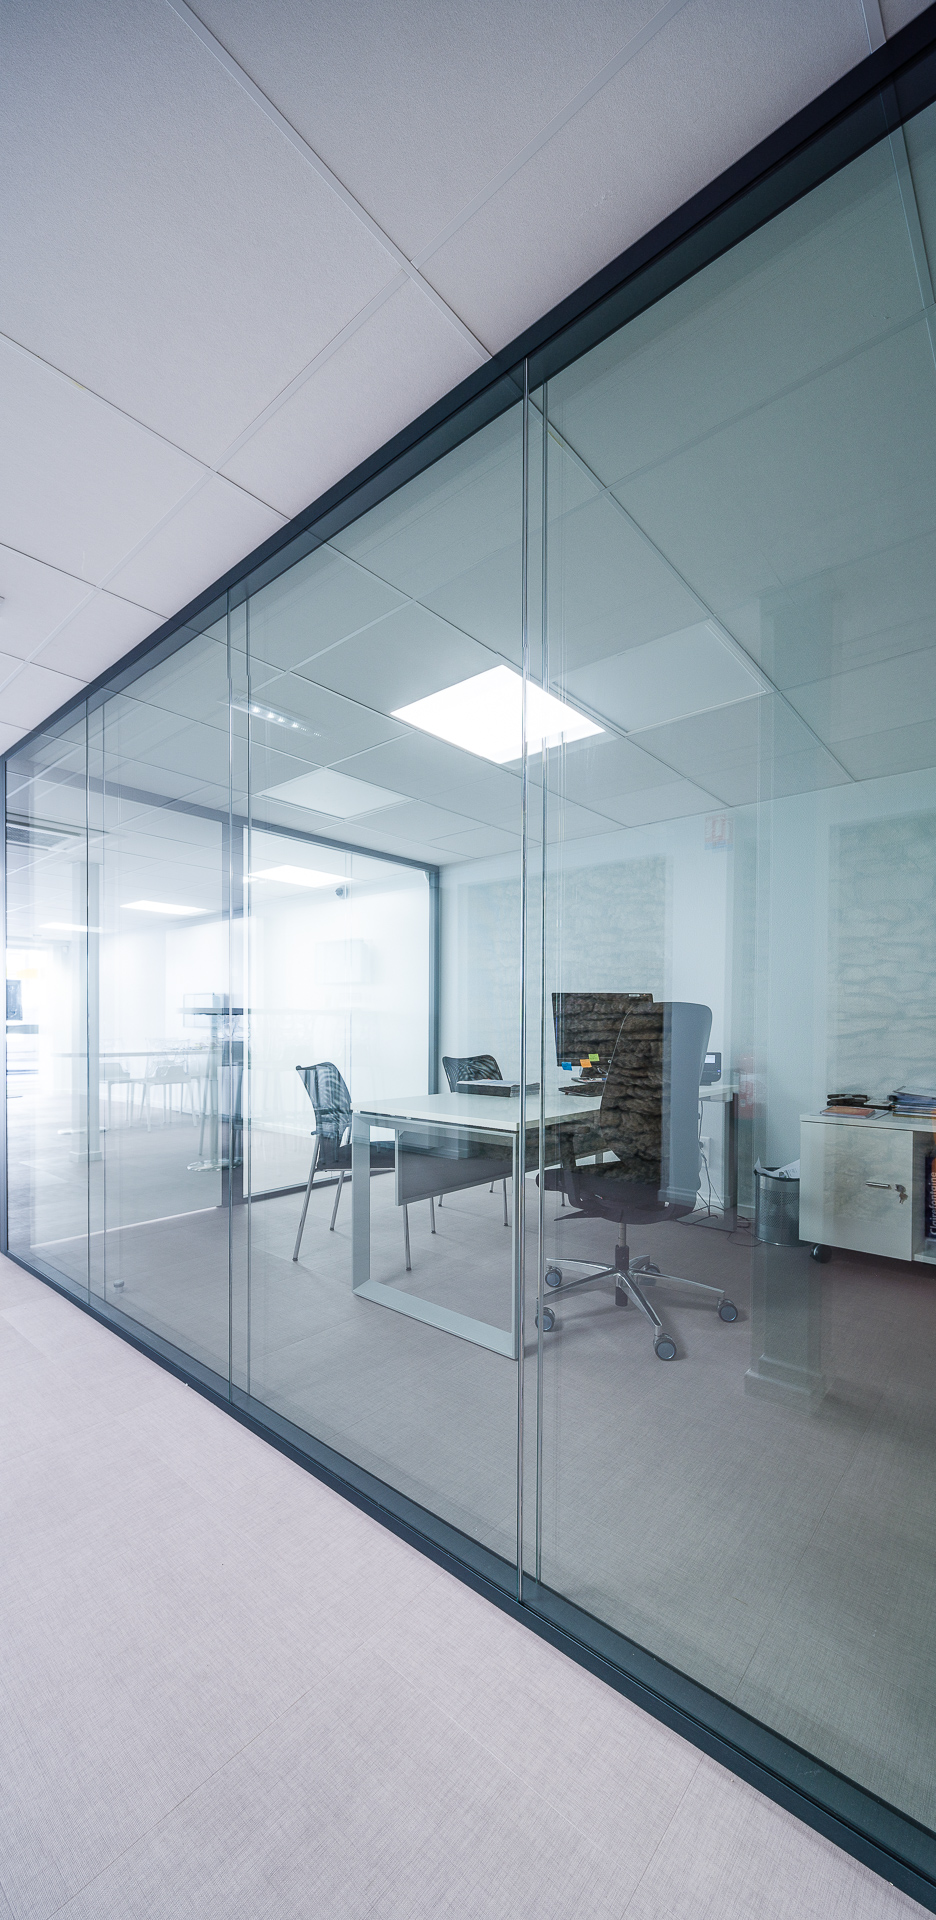 cloisons transparentes fashion designs. Black Bedroom Furniture Sets. Home Design Ideas